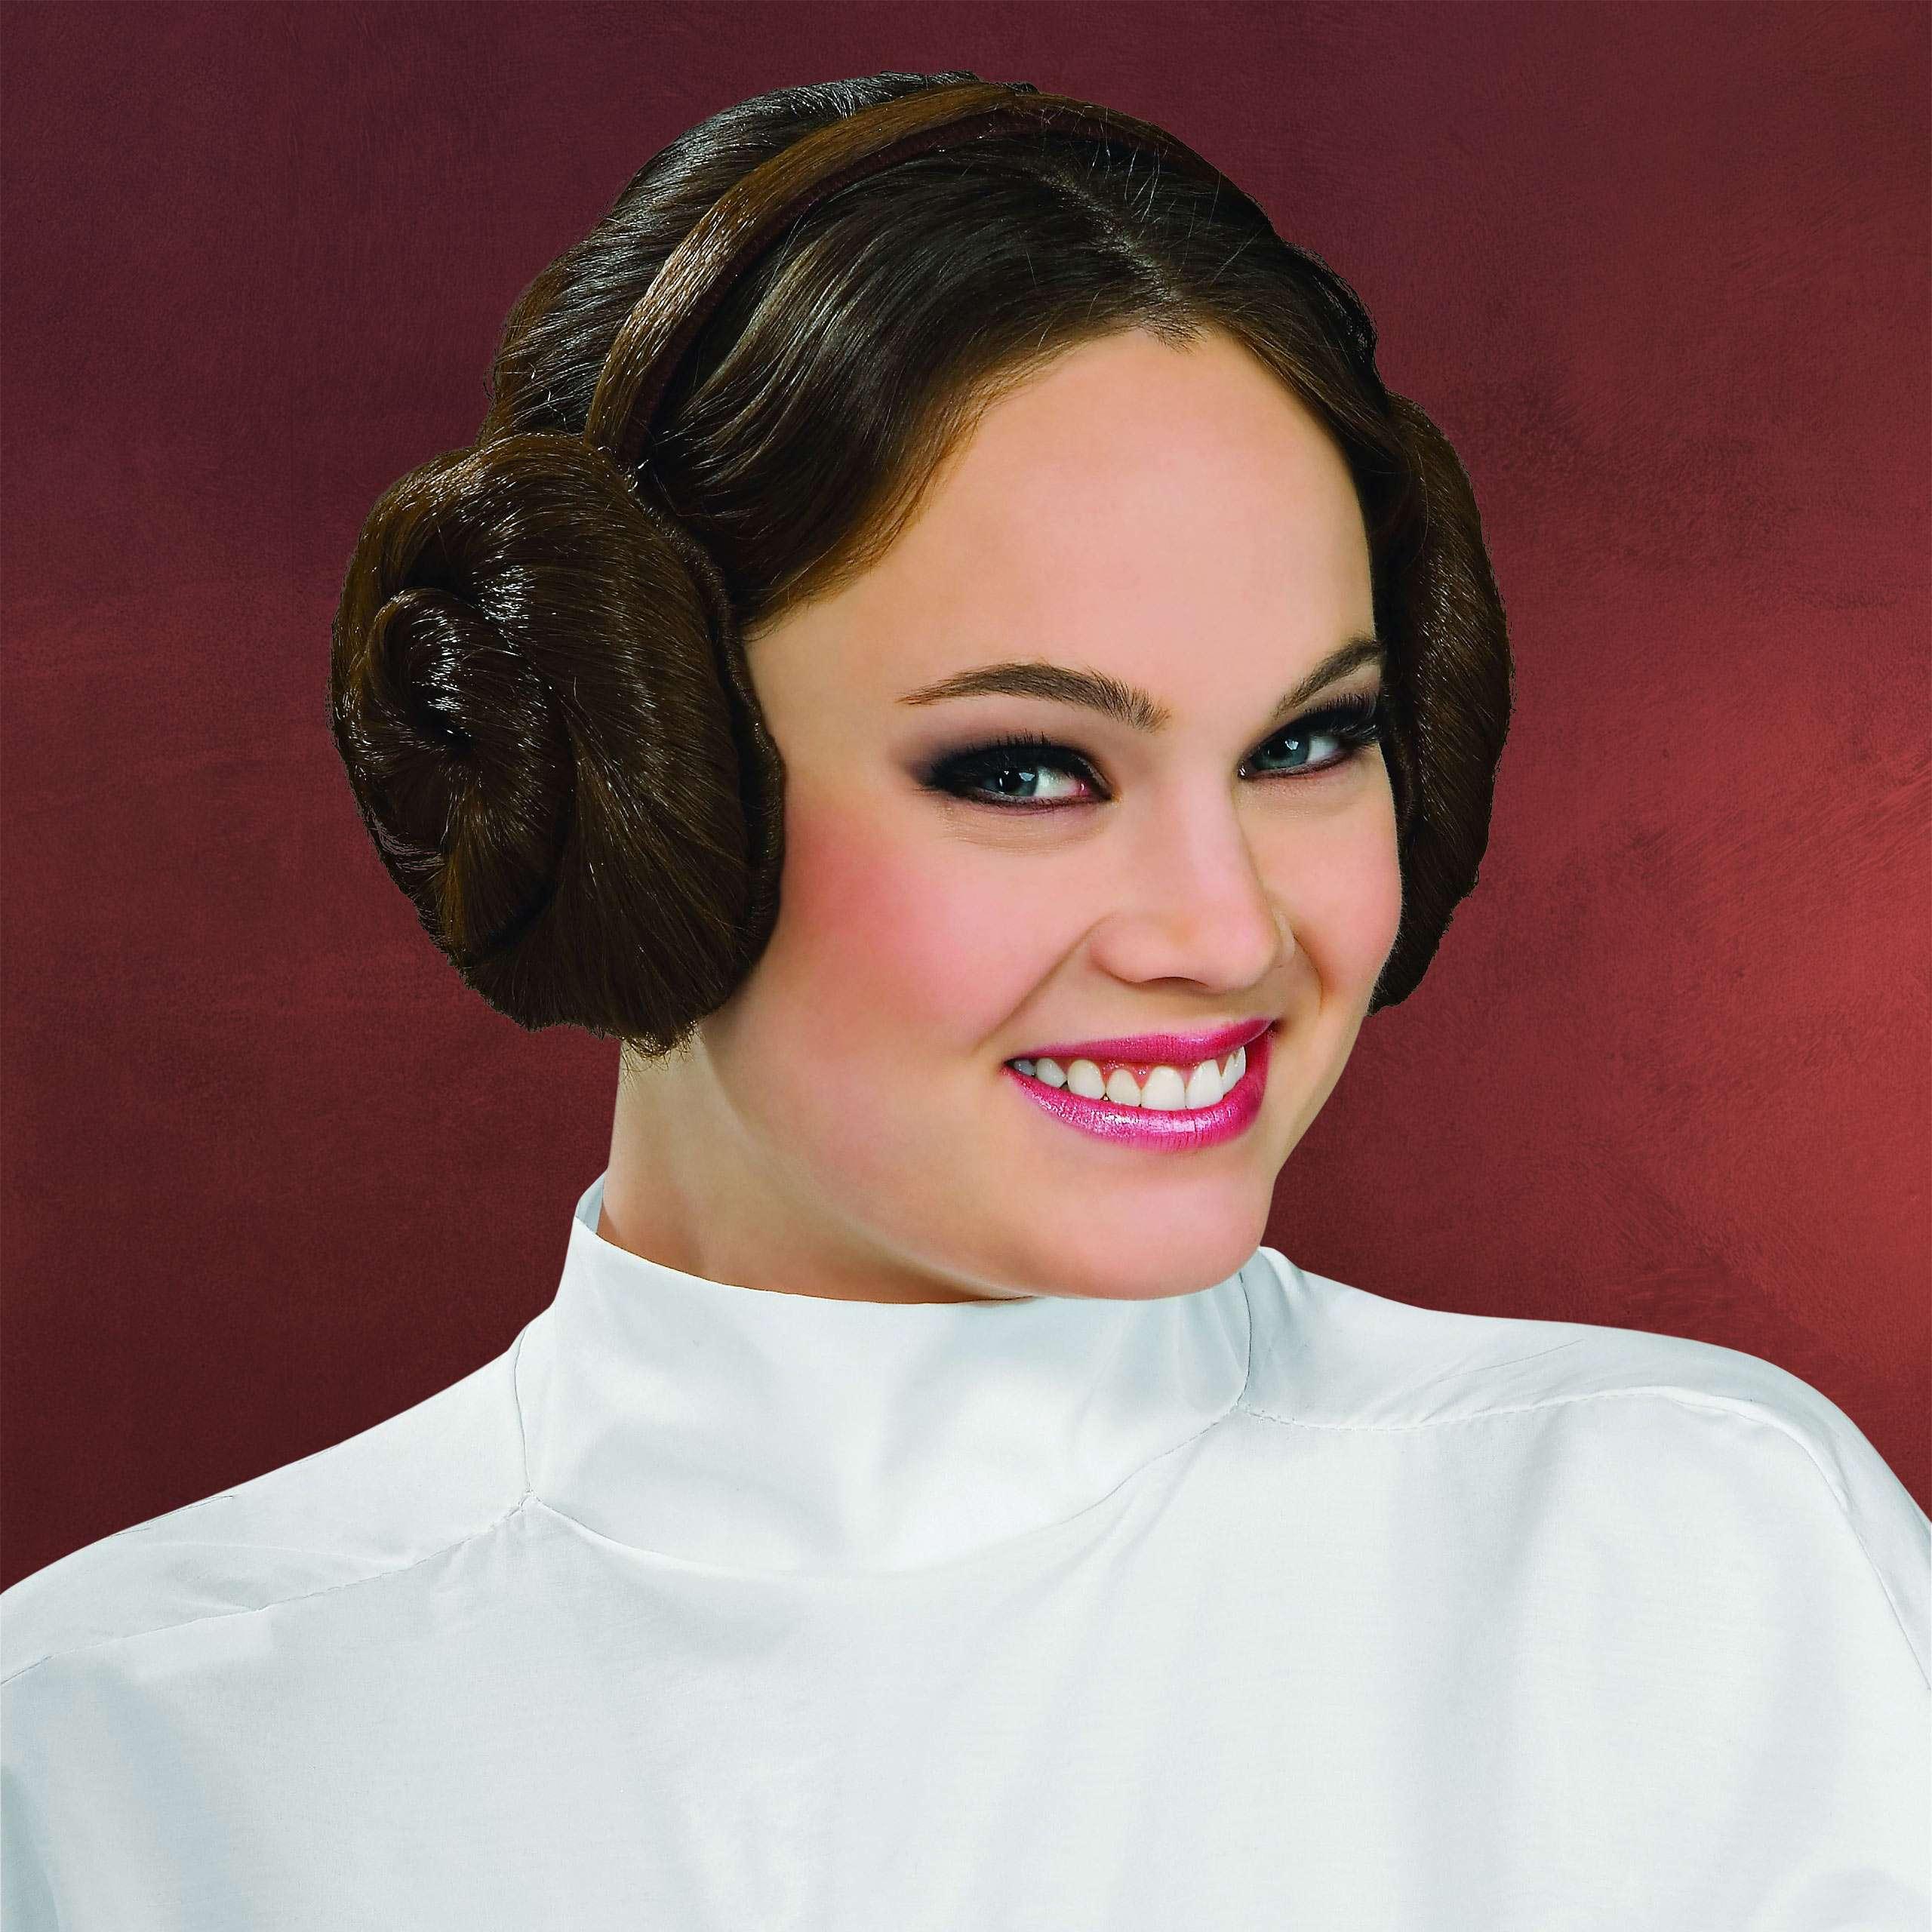 Star Wars Prinzessin Leia Frisuren Haarreif Elbenwald